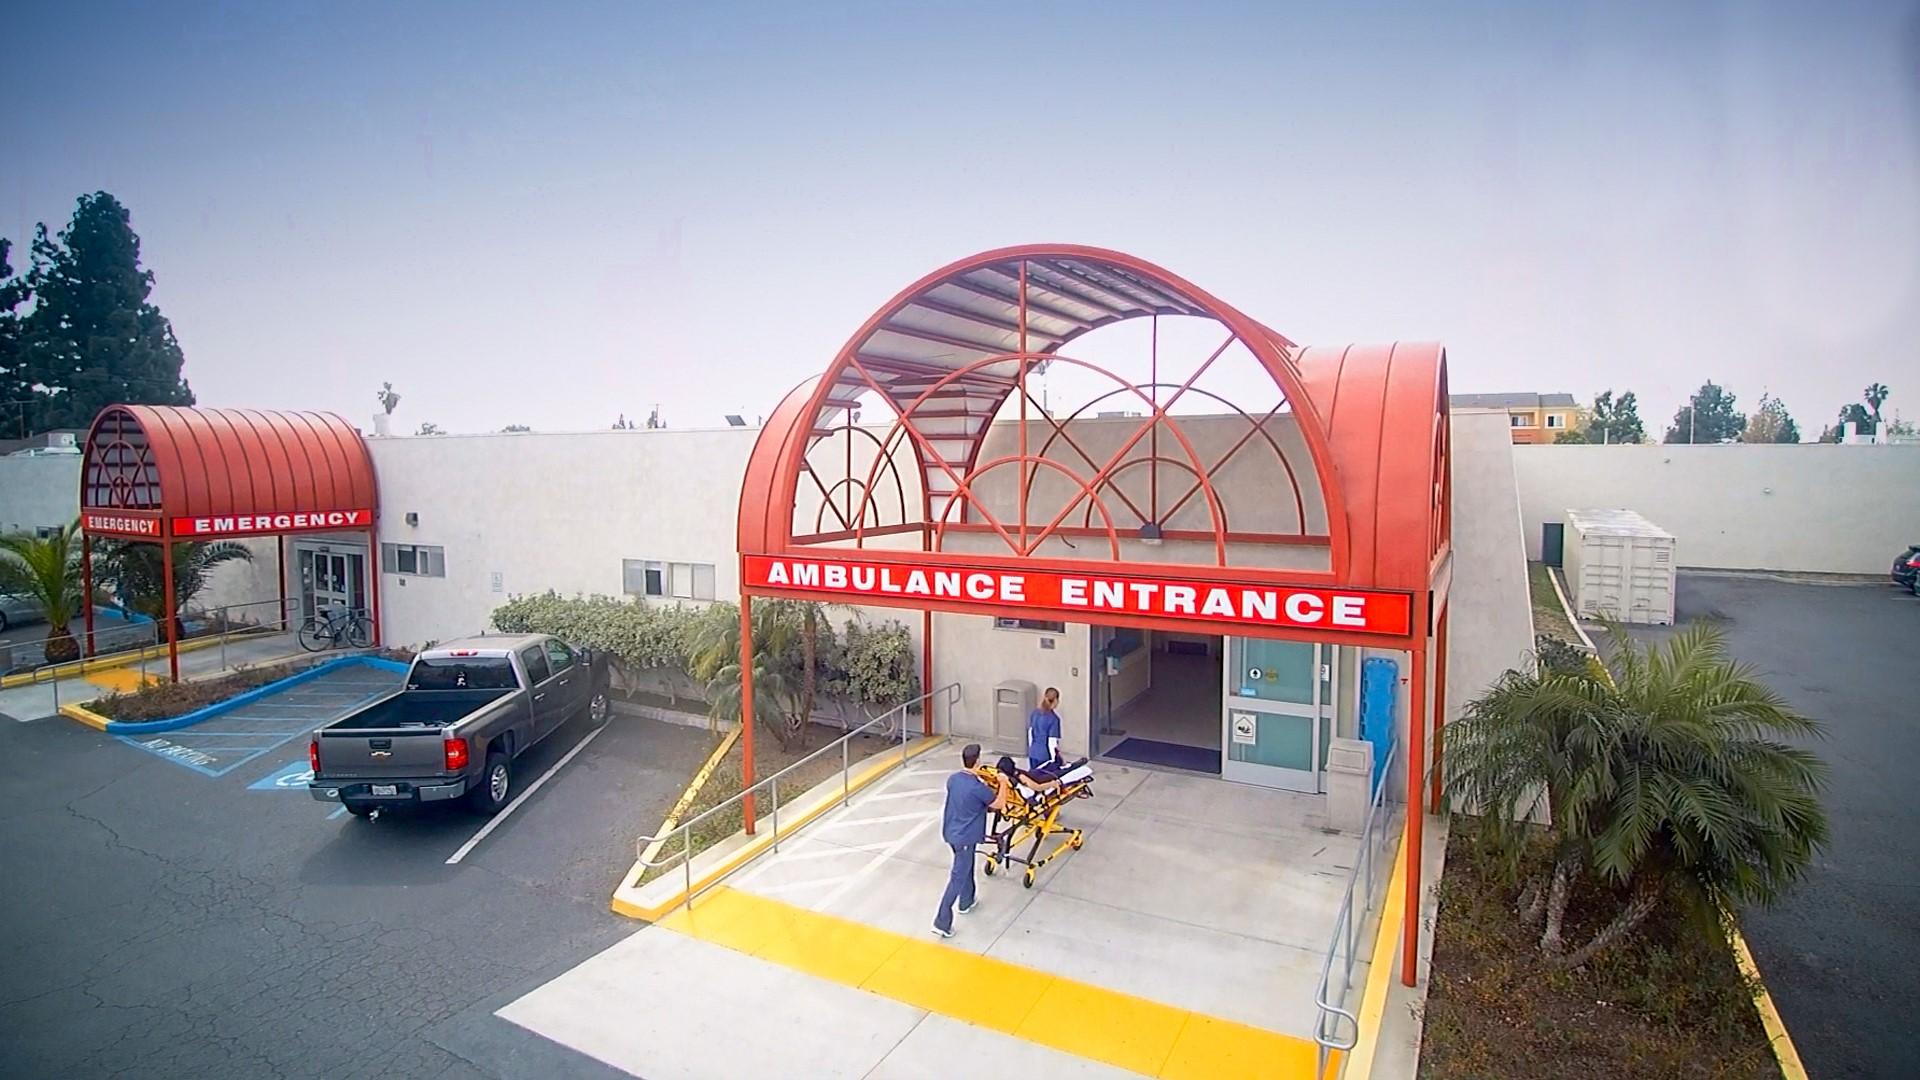 Foothill Regional Medical Center image 3